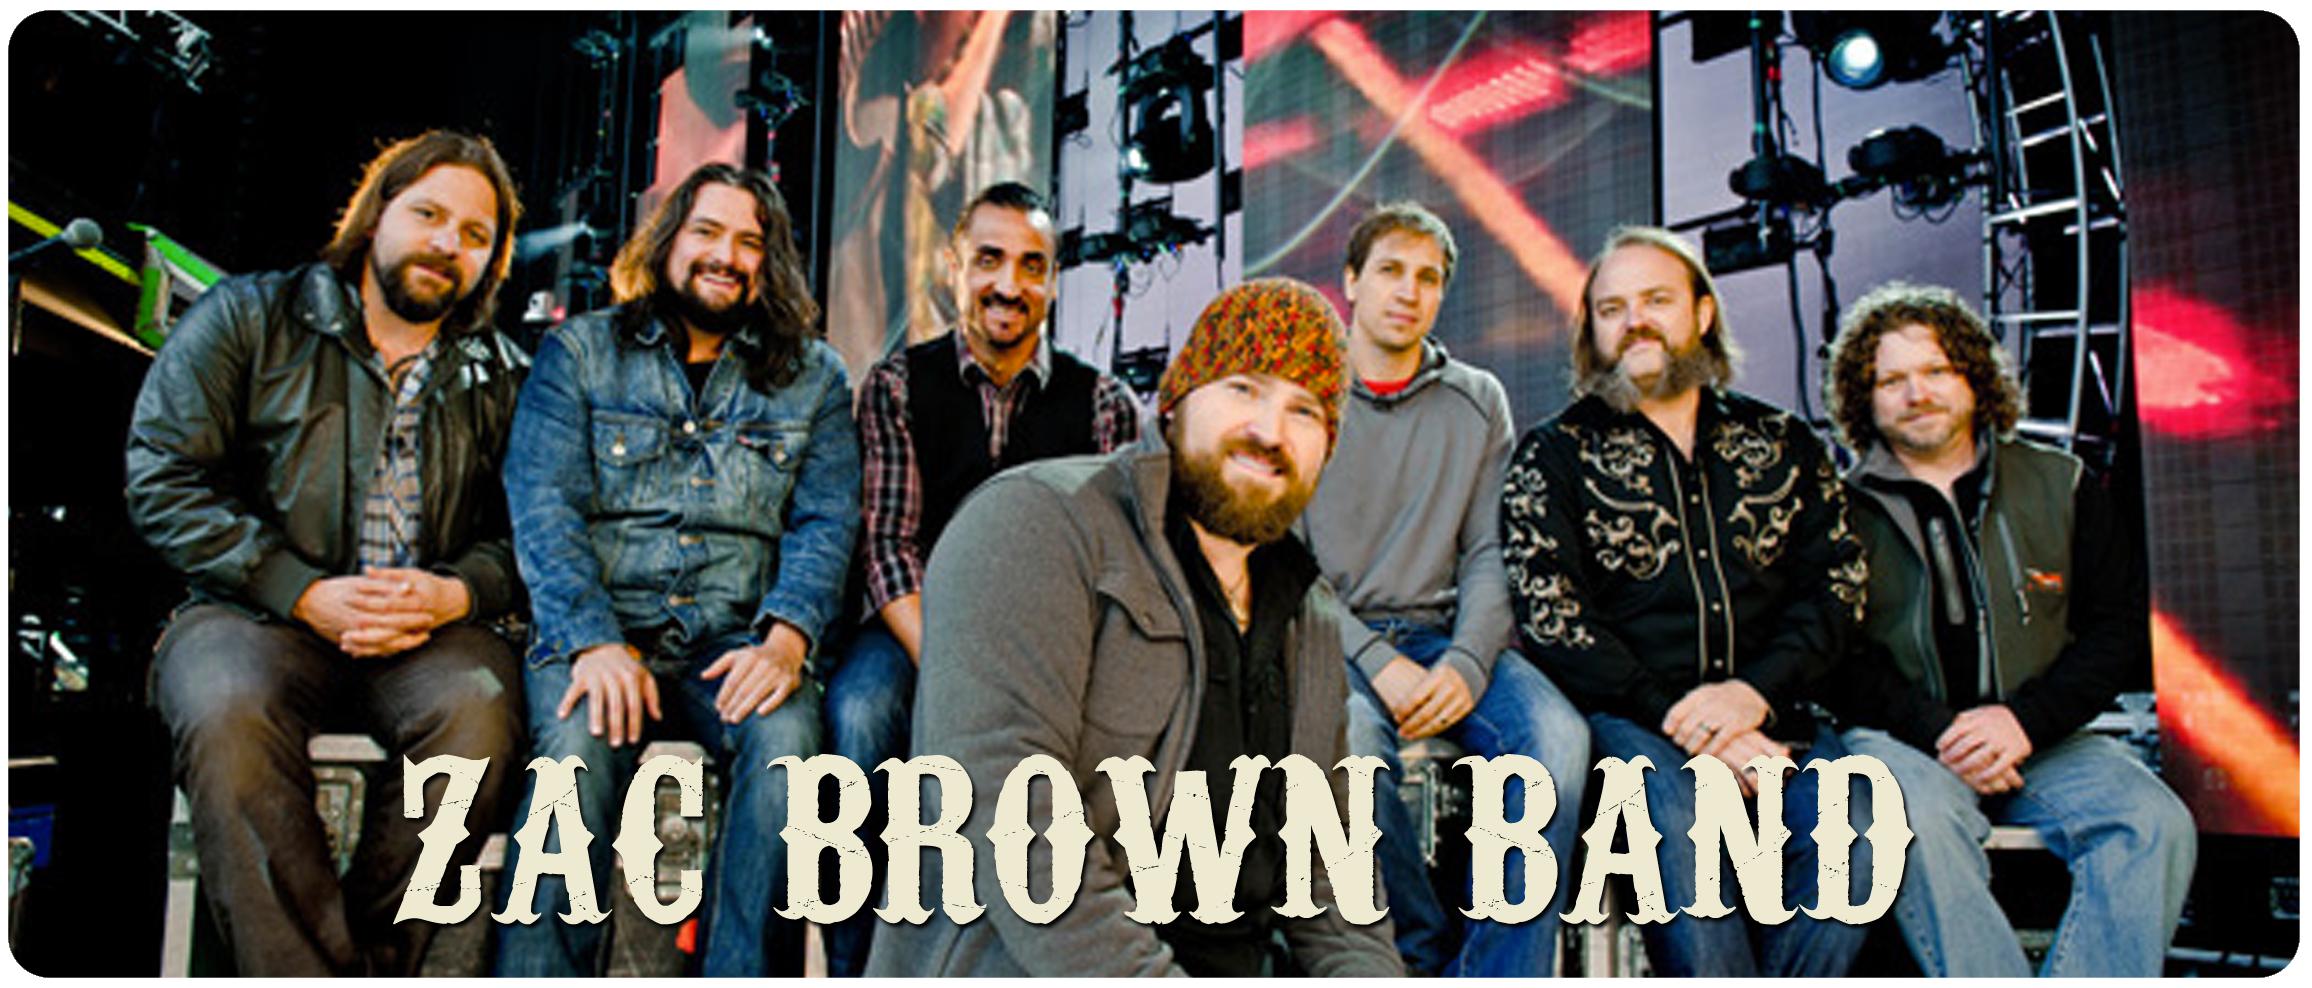 Zac Brown Band Announce New Oz Tour Dates - Kix Country Radio Network